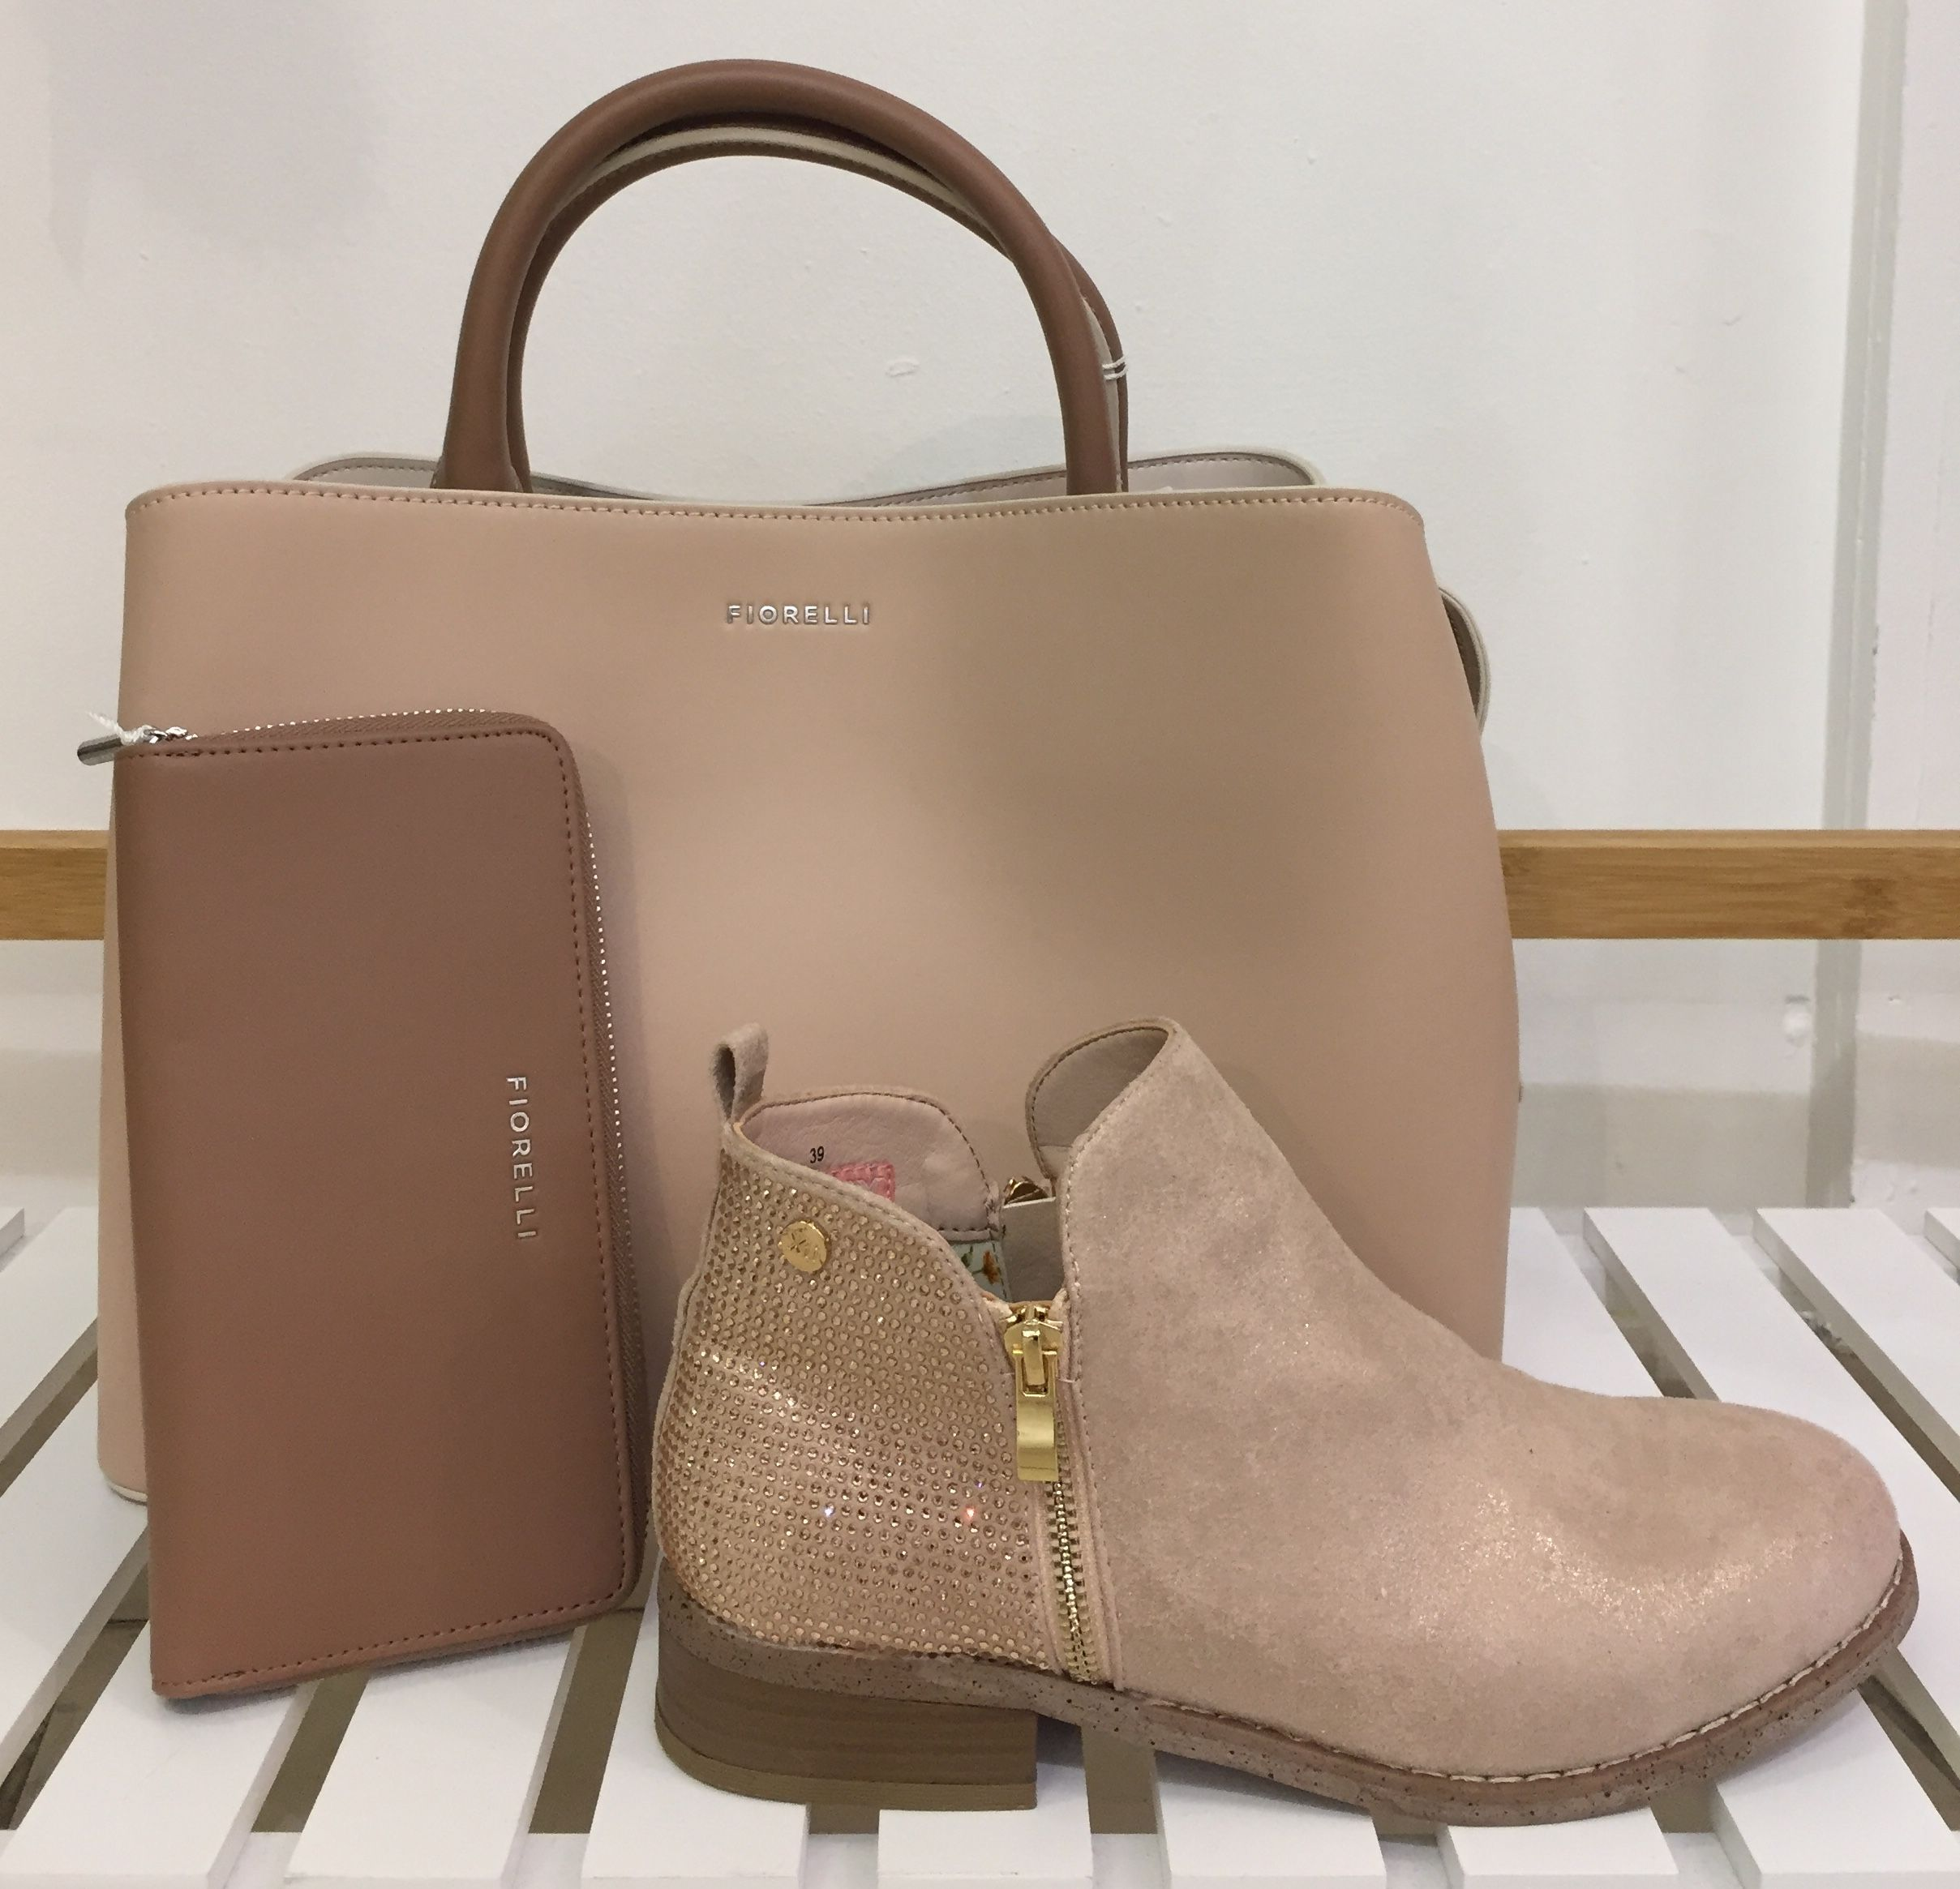 4e37f8726ce4 Fiorelli Nude Bethnal Triple Compartment Grab Bag | colourblock | nude  boots | taupe purse